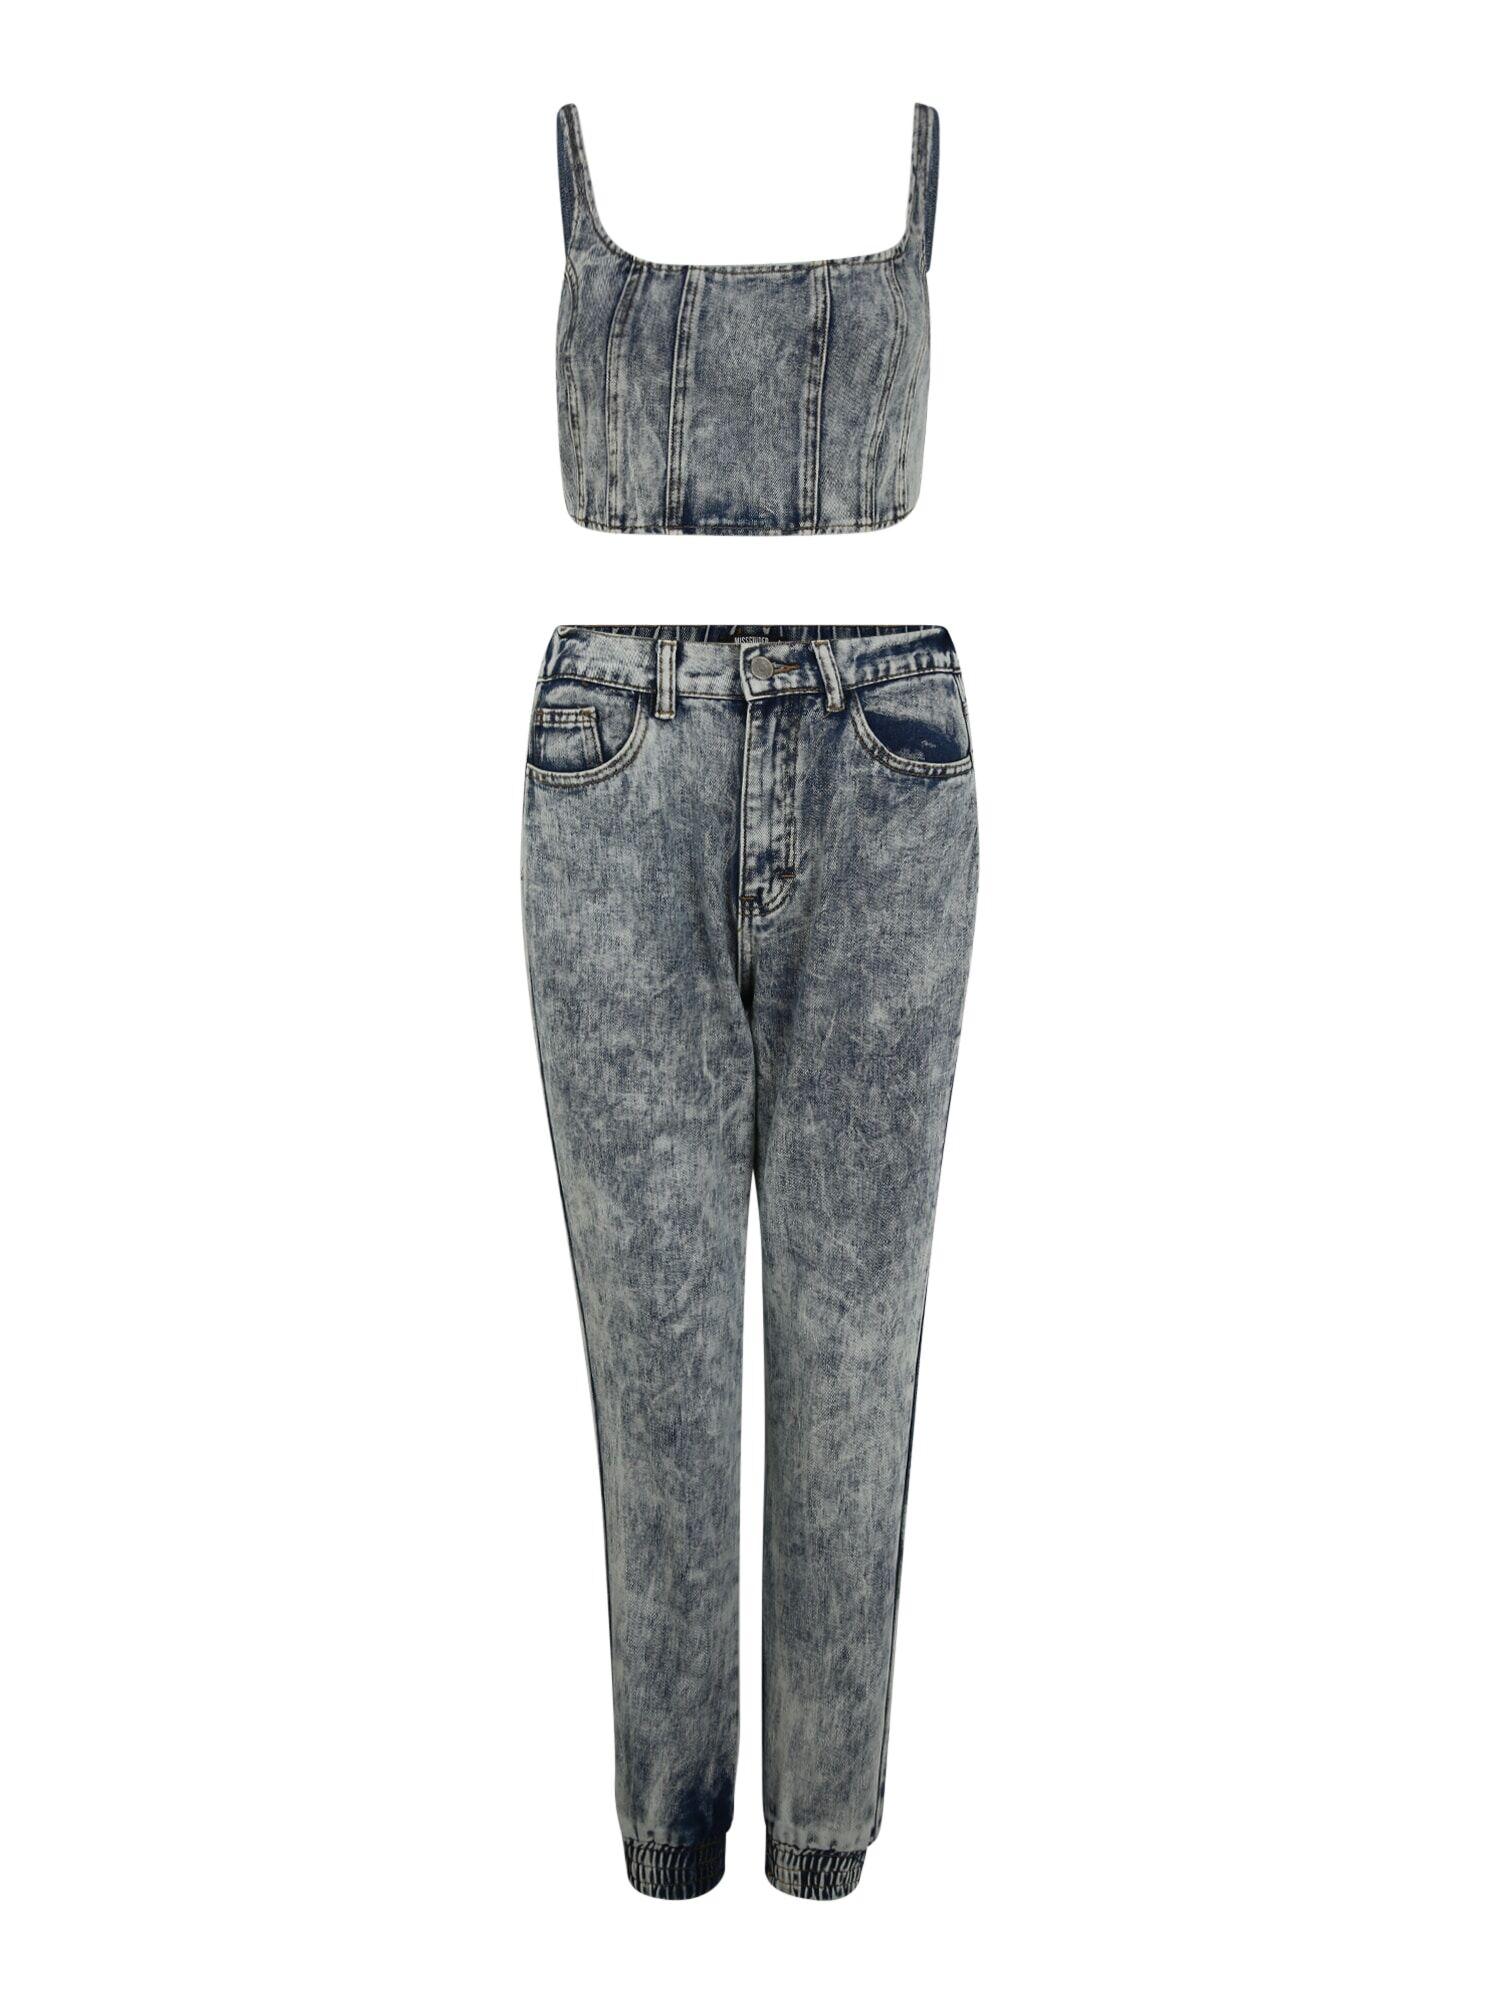 Missguided Petite Jean  - Bleu - Taille: 14 - female